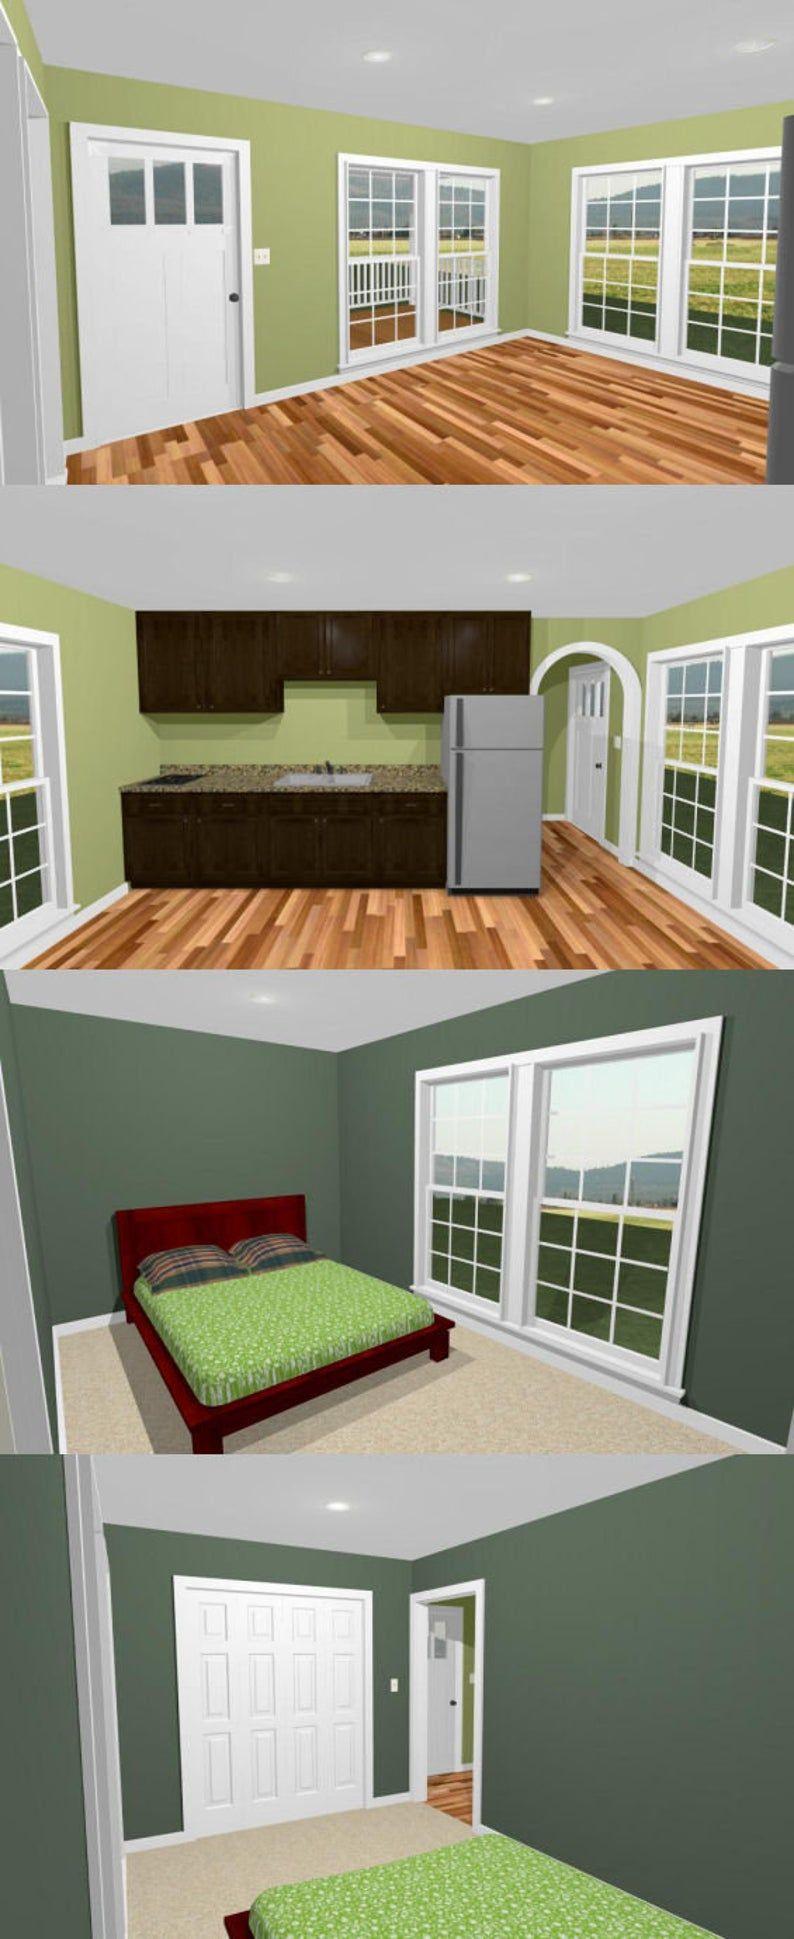 16x28 House 1-Bedroom 1-Bath 447 sq ft PDF Floor Plan ...